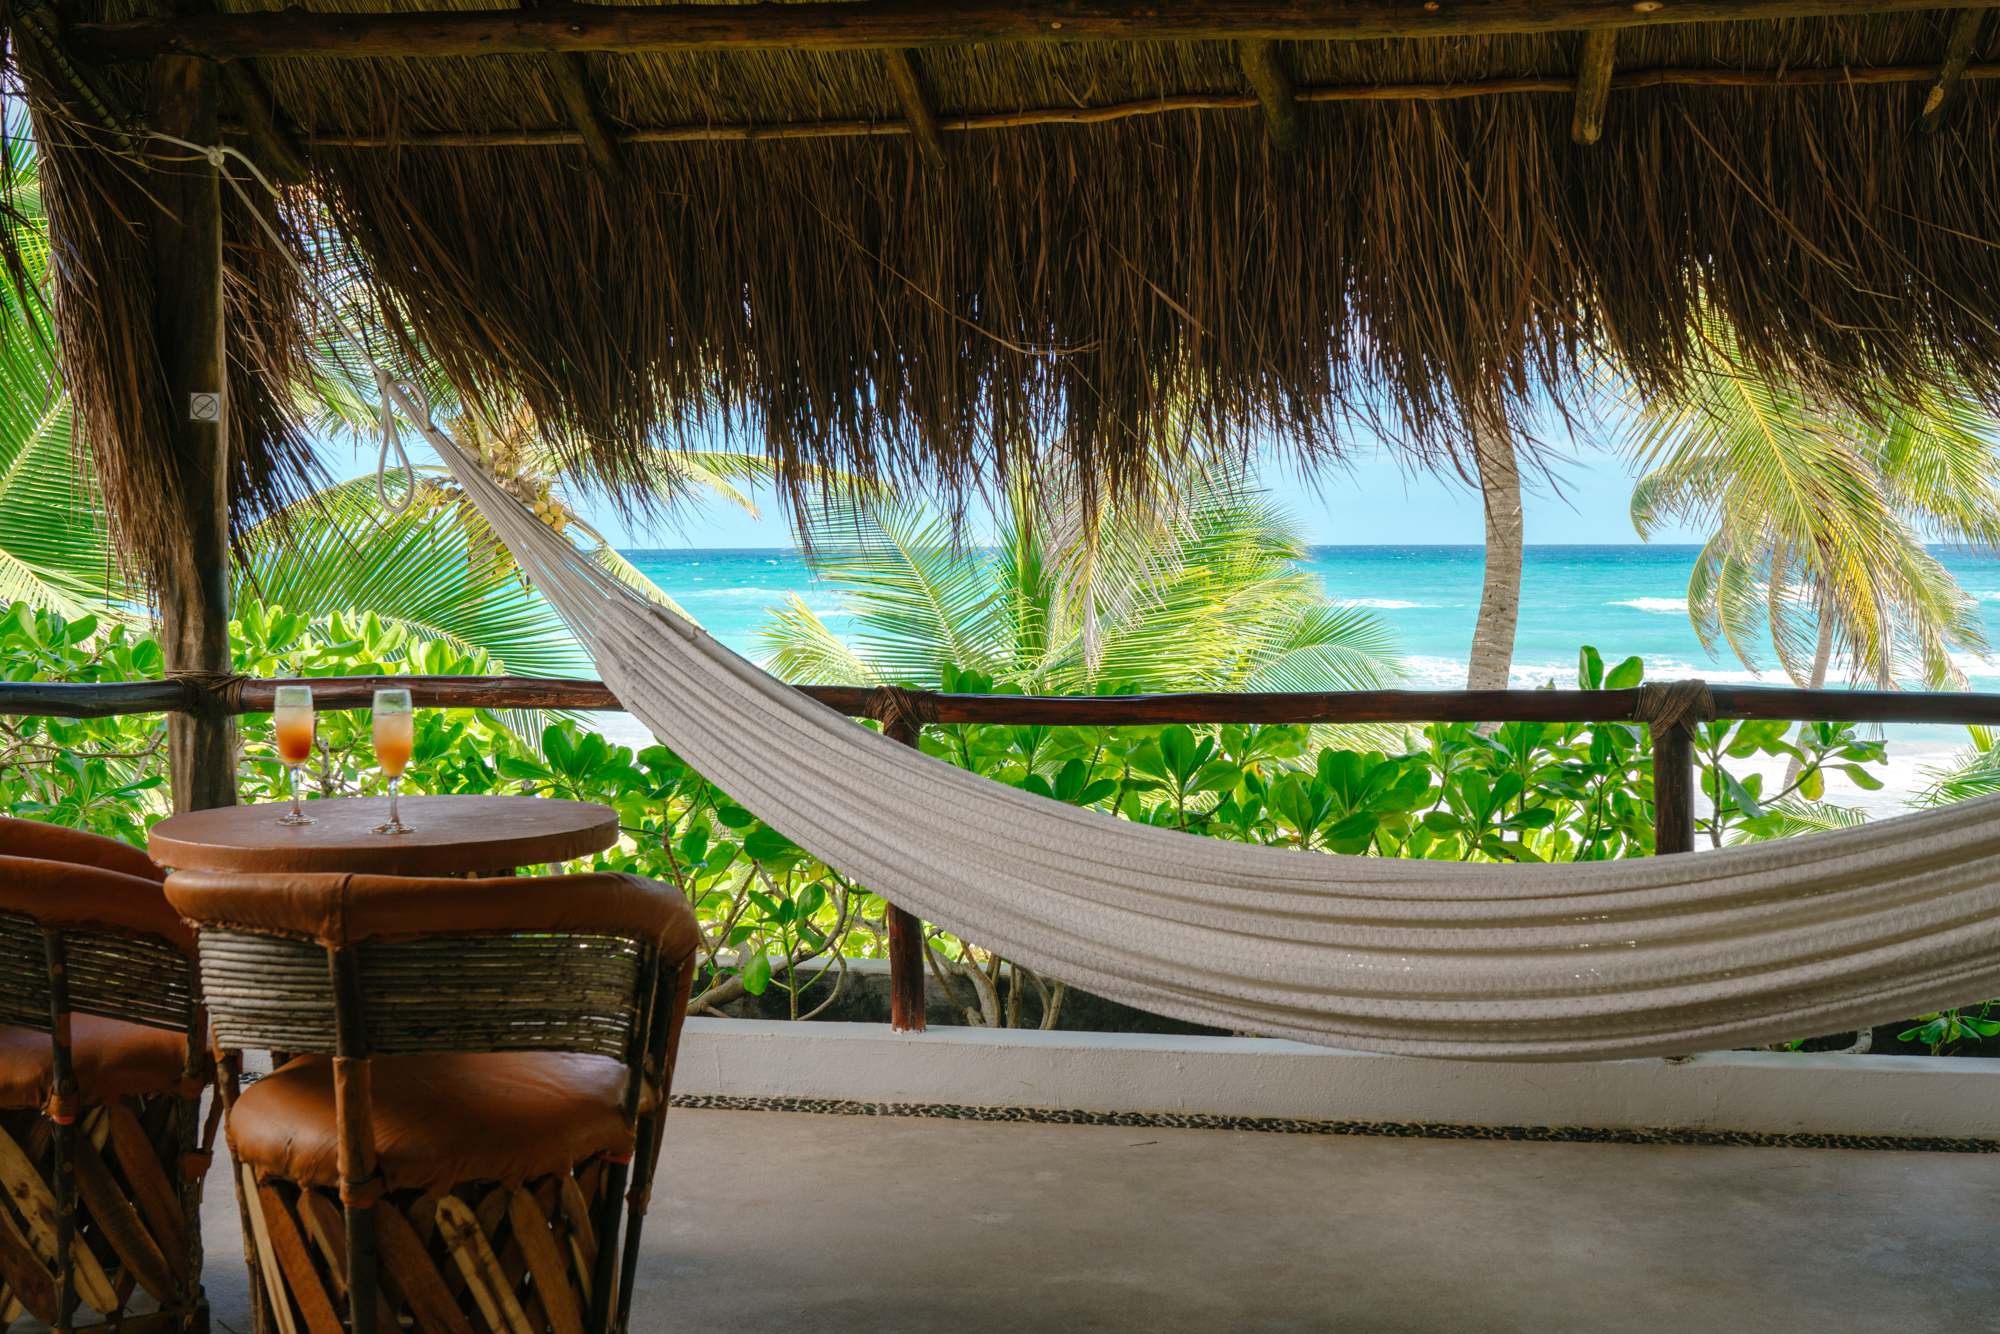 Beachfront hammock in Tulum